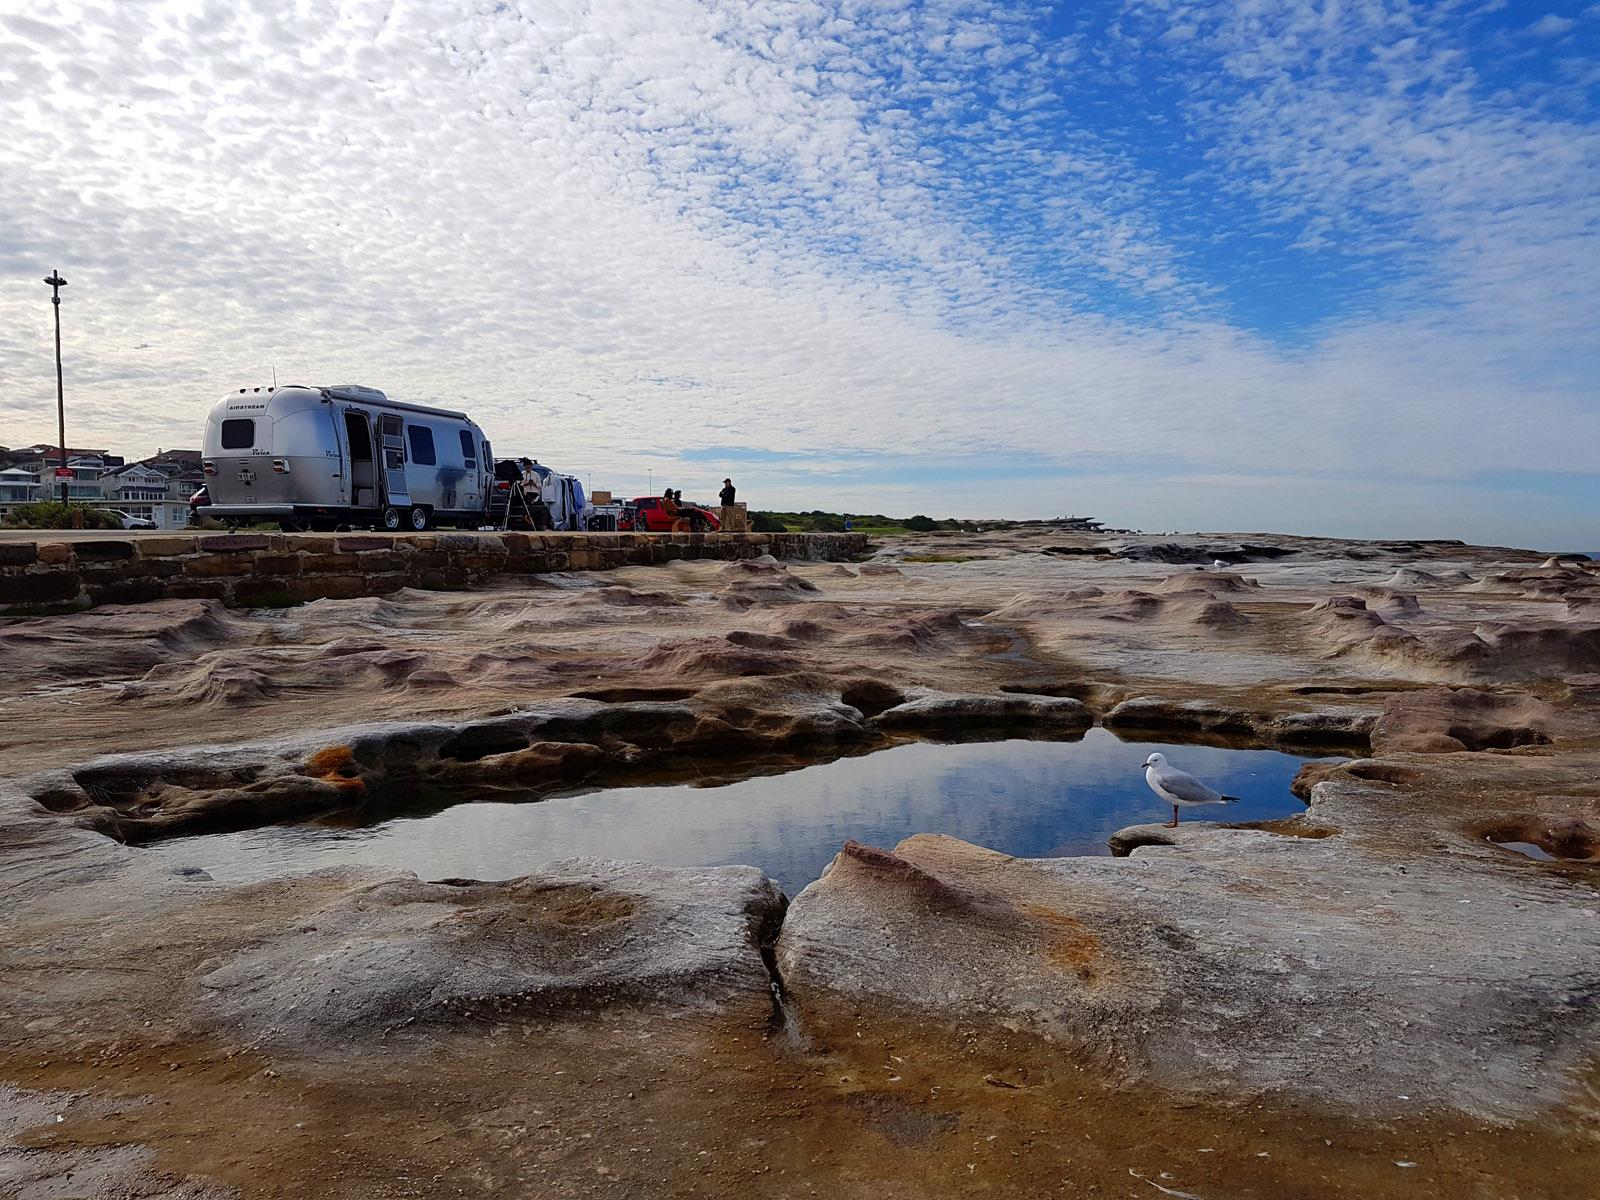 SGMT Australia Sydney_Bondi to Coogee Coastal Walk_15 Clovelly Beach Car Park Clouds and Birds